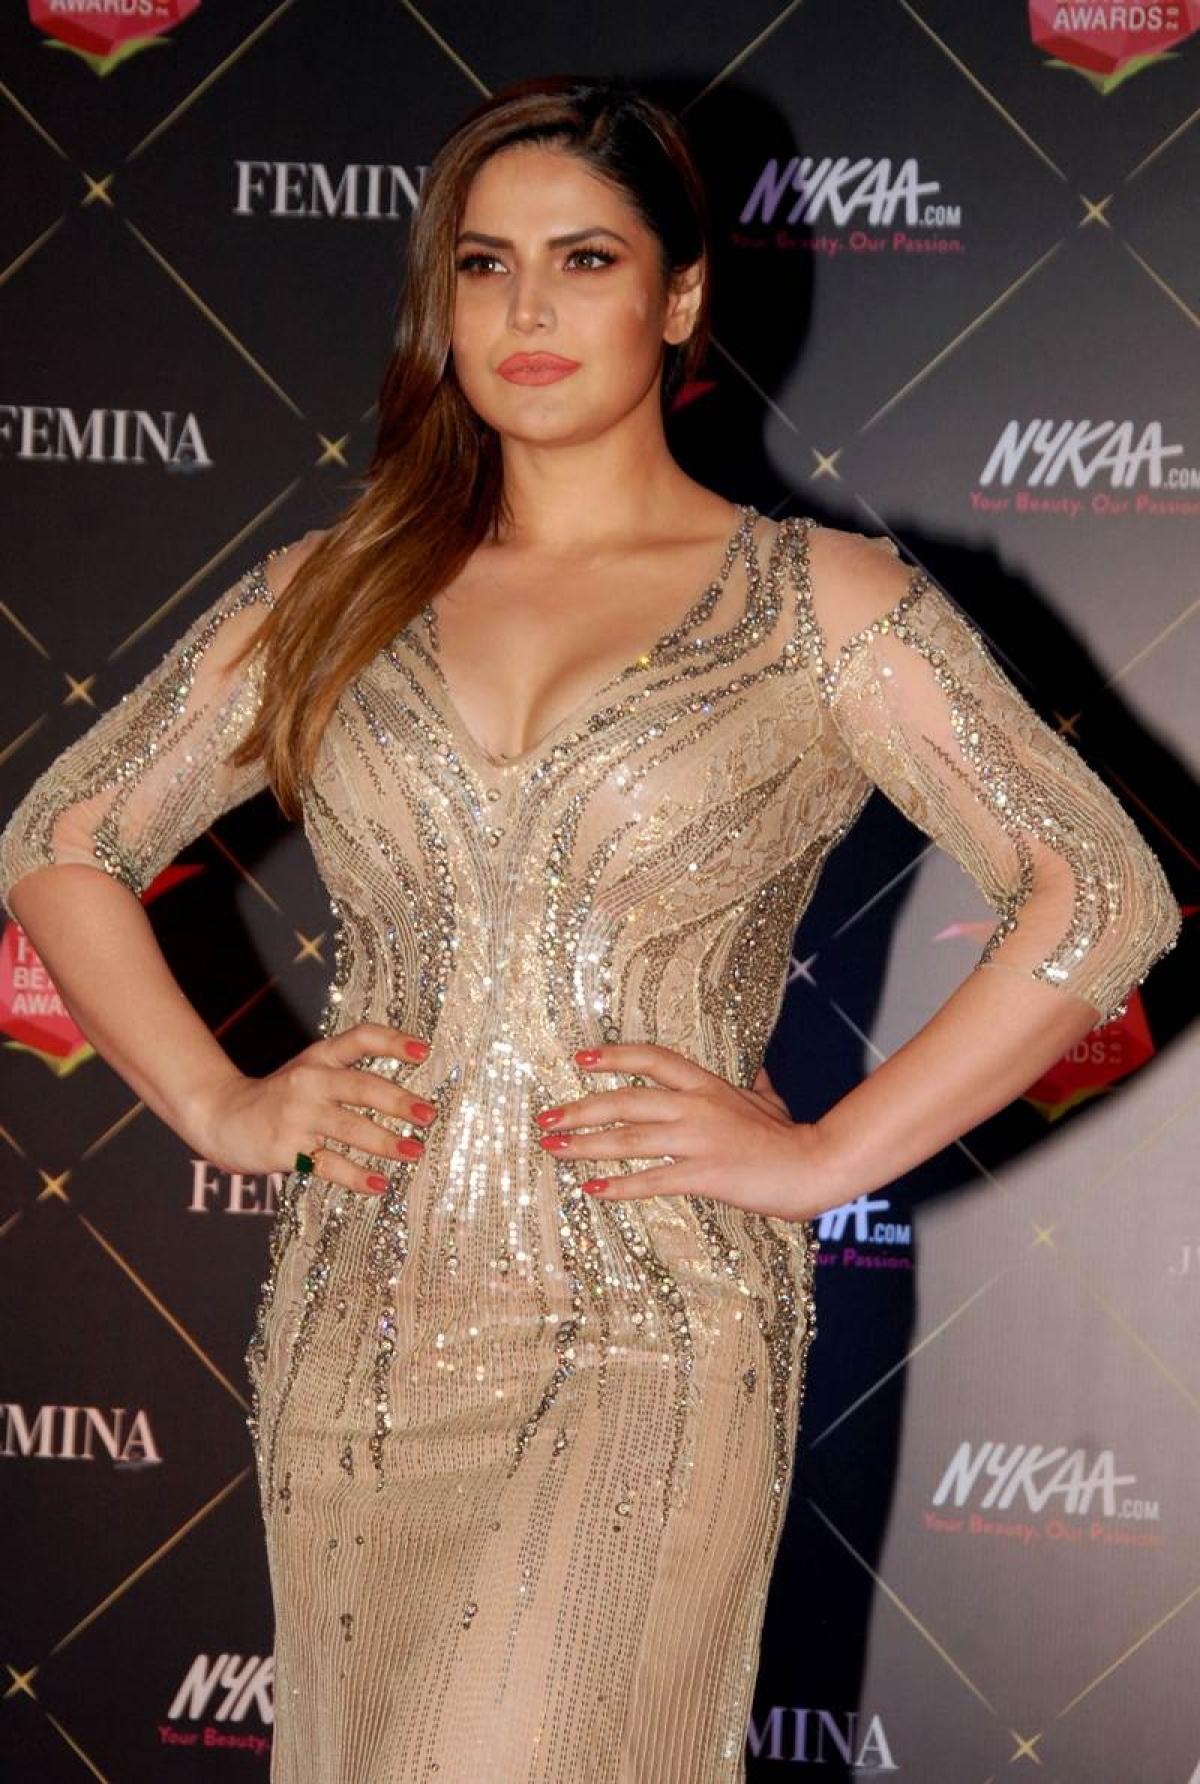 Zareen Khan poses during the 'Femina Beauty Awards 2018' in Mumbai. / AFP PHOTO / Sujit Jaiswal